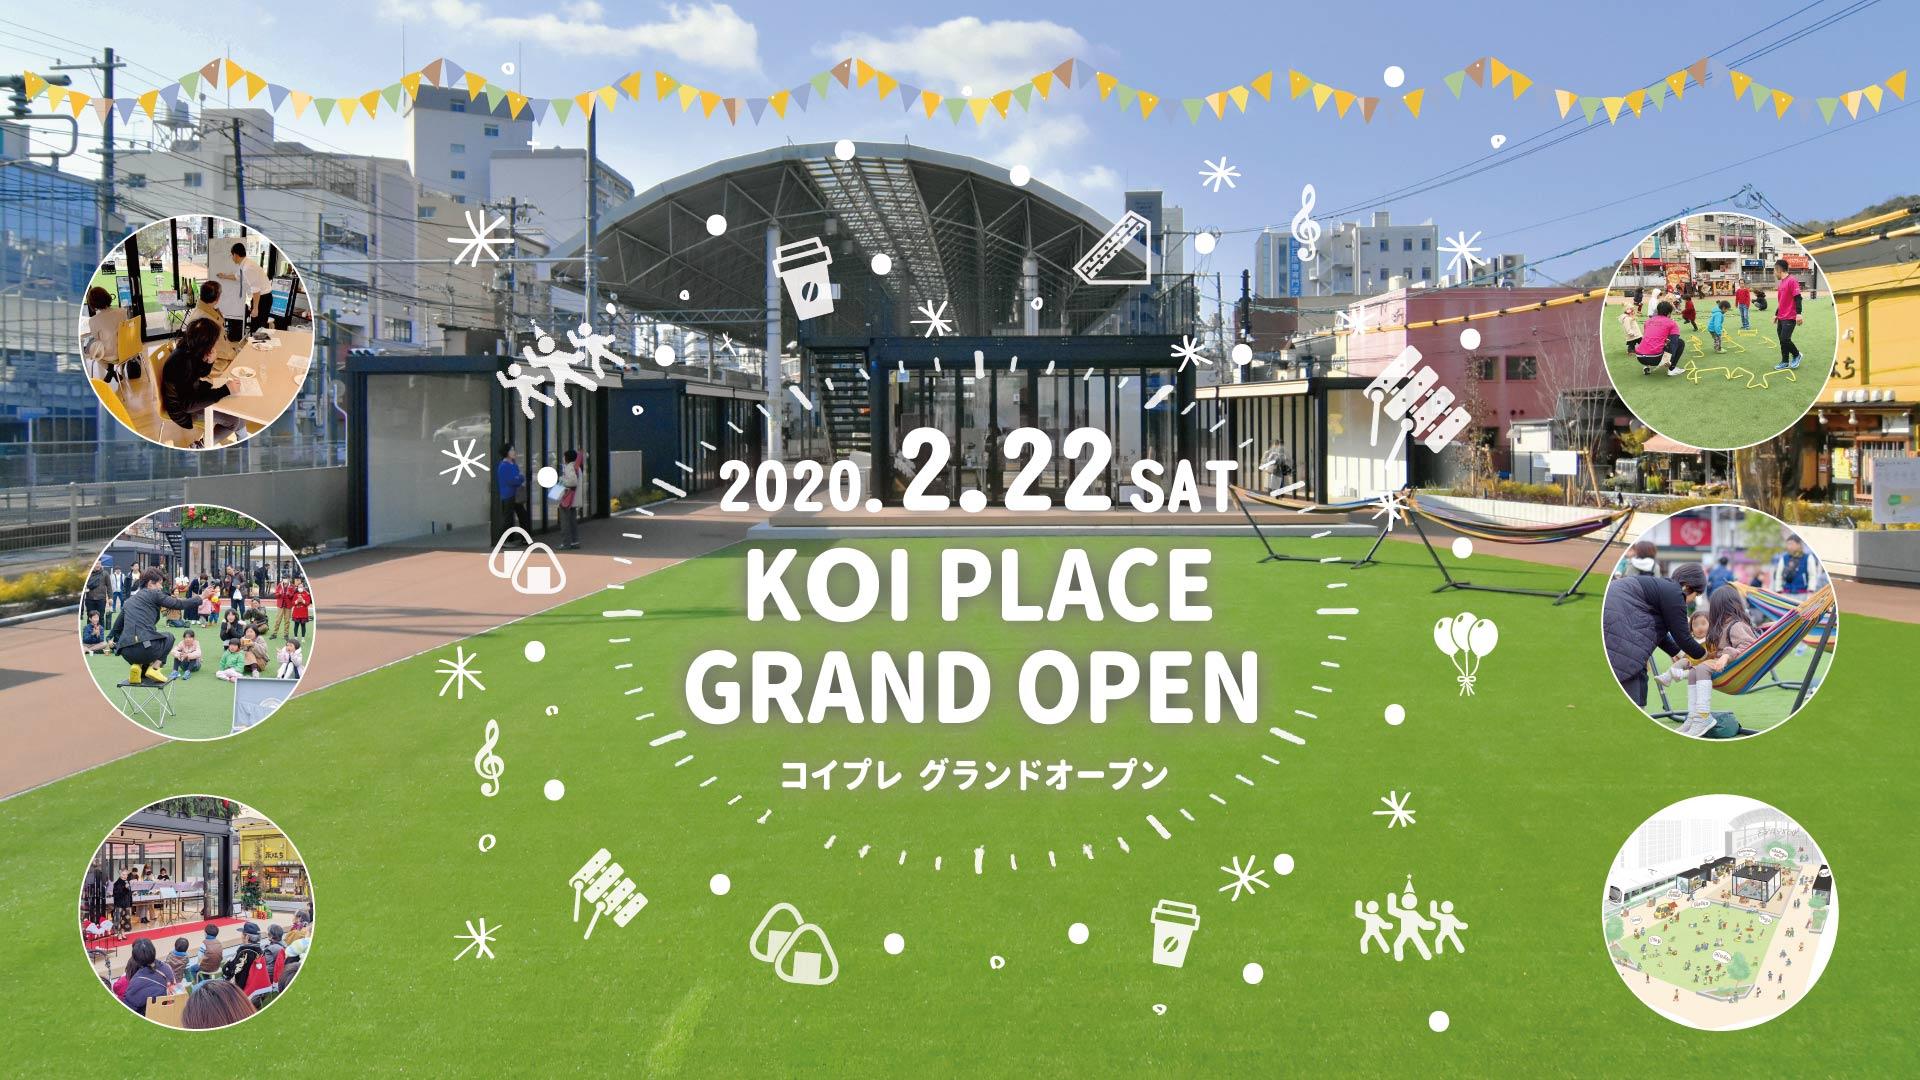 KOI PLACE グランドオープン